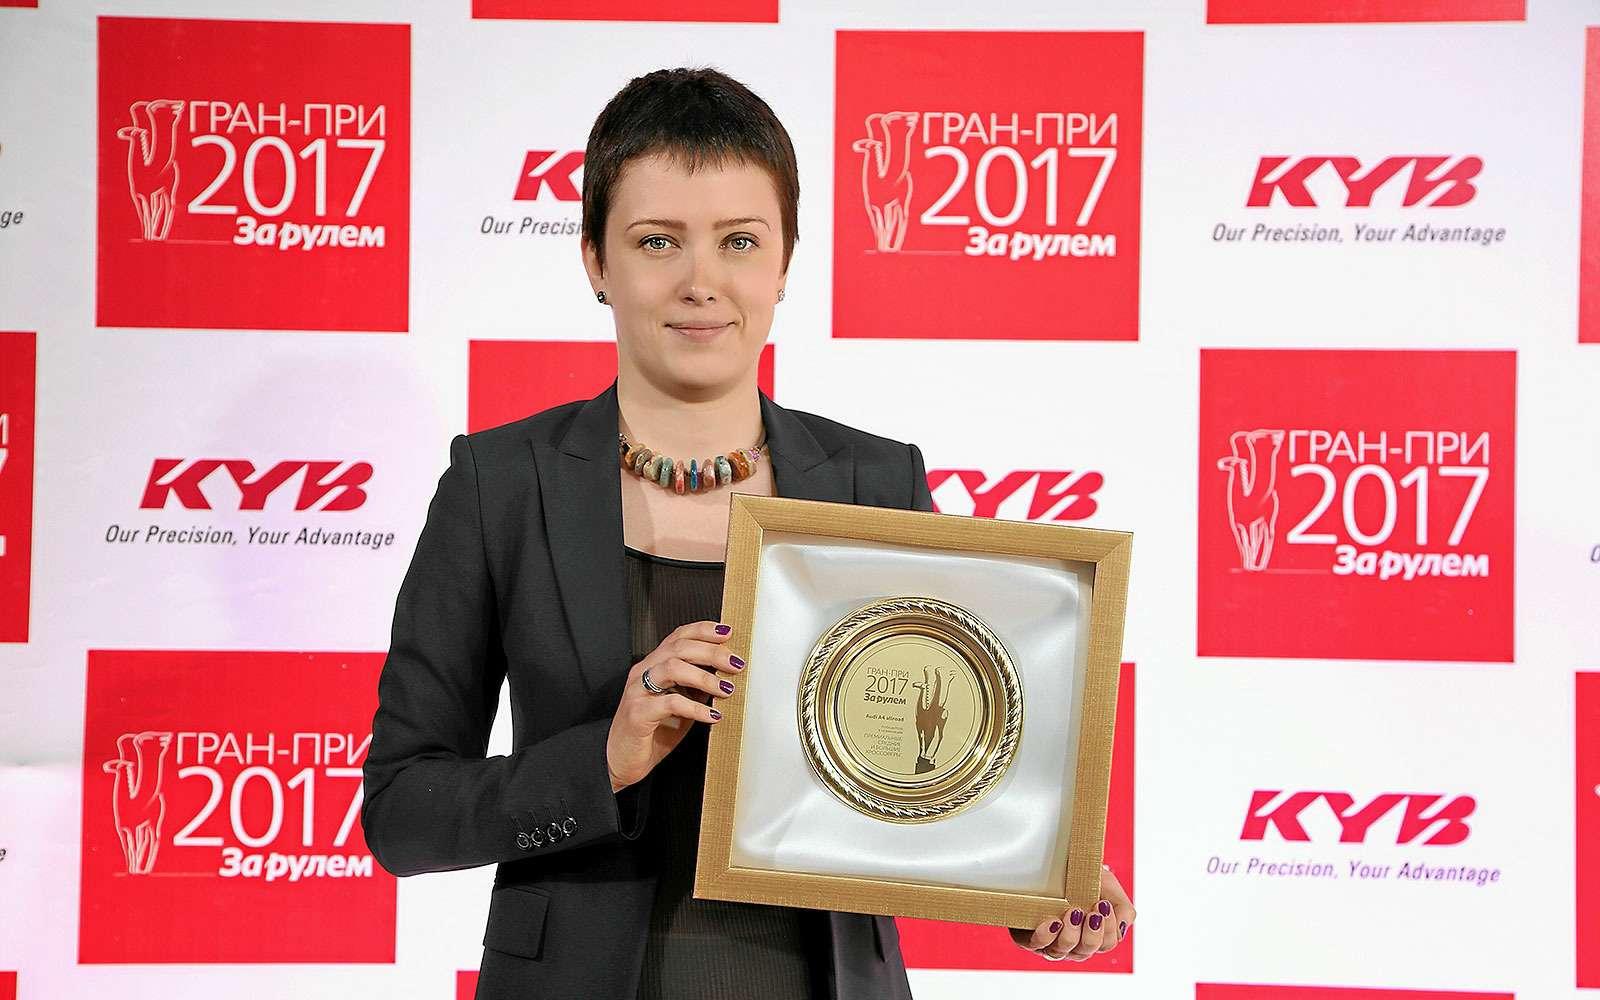 Гран-при «Зарулем»— 2017: награды вручены!— фото 740482